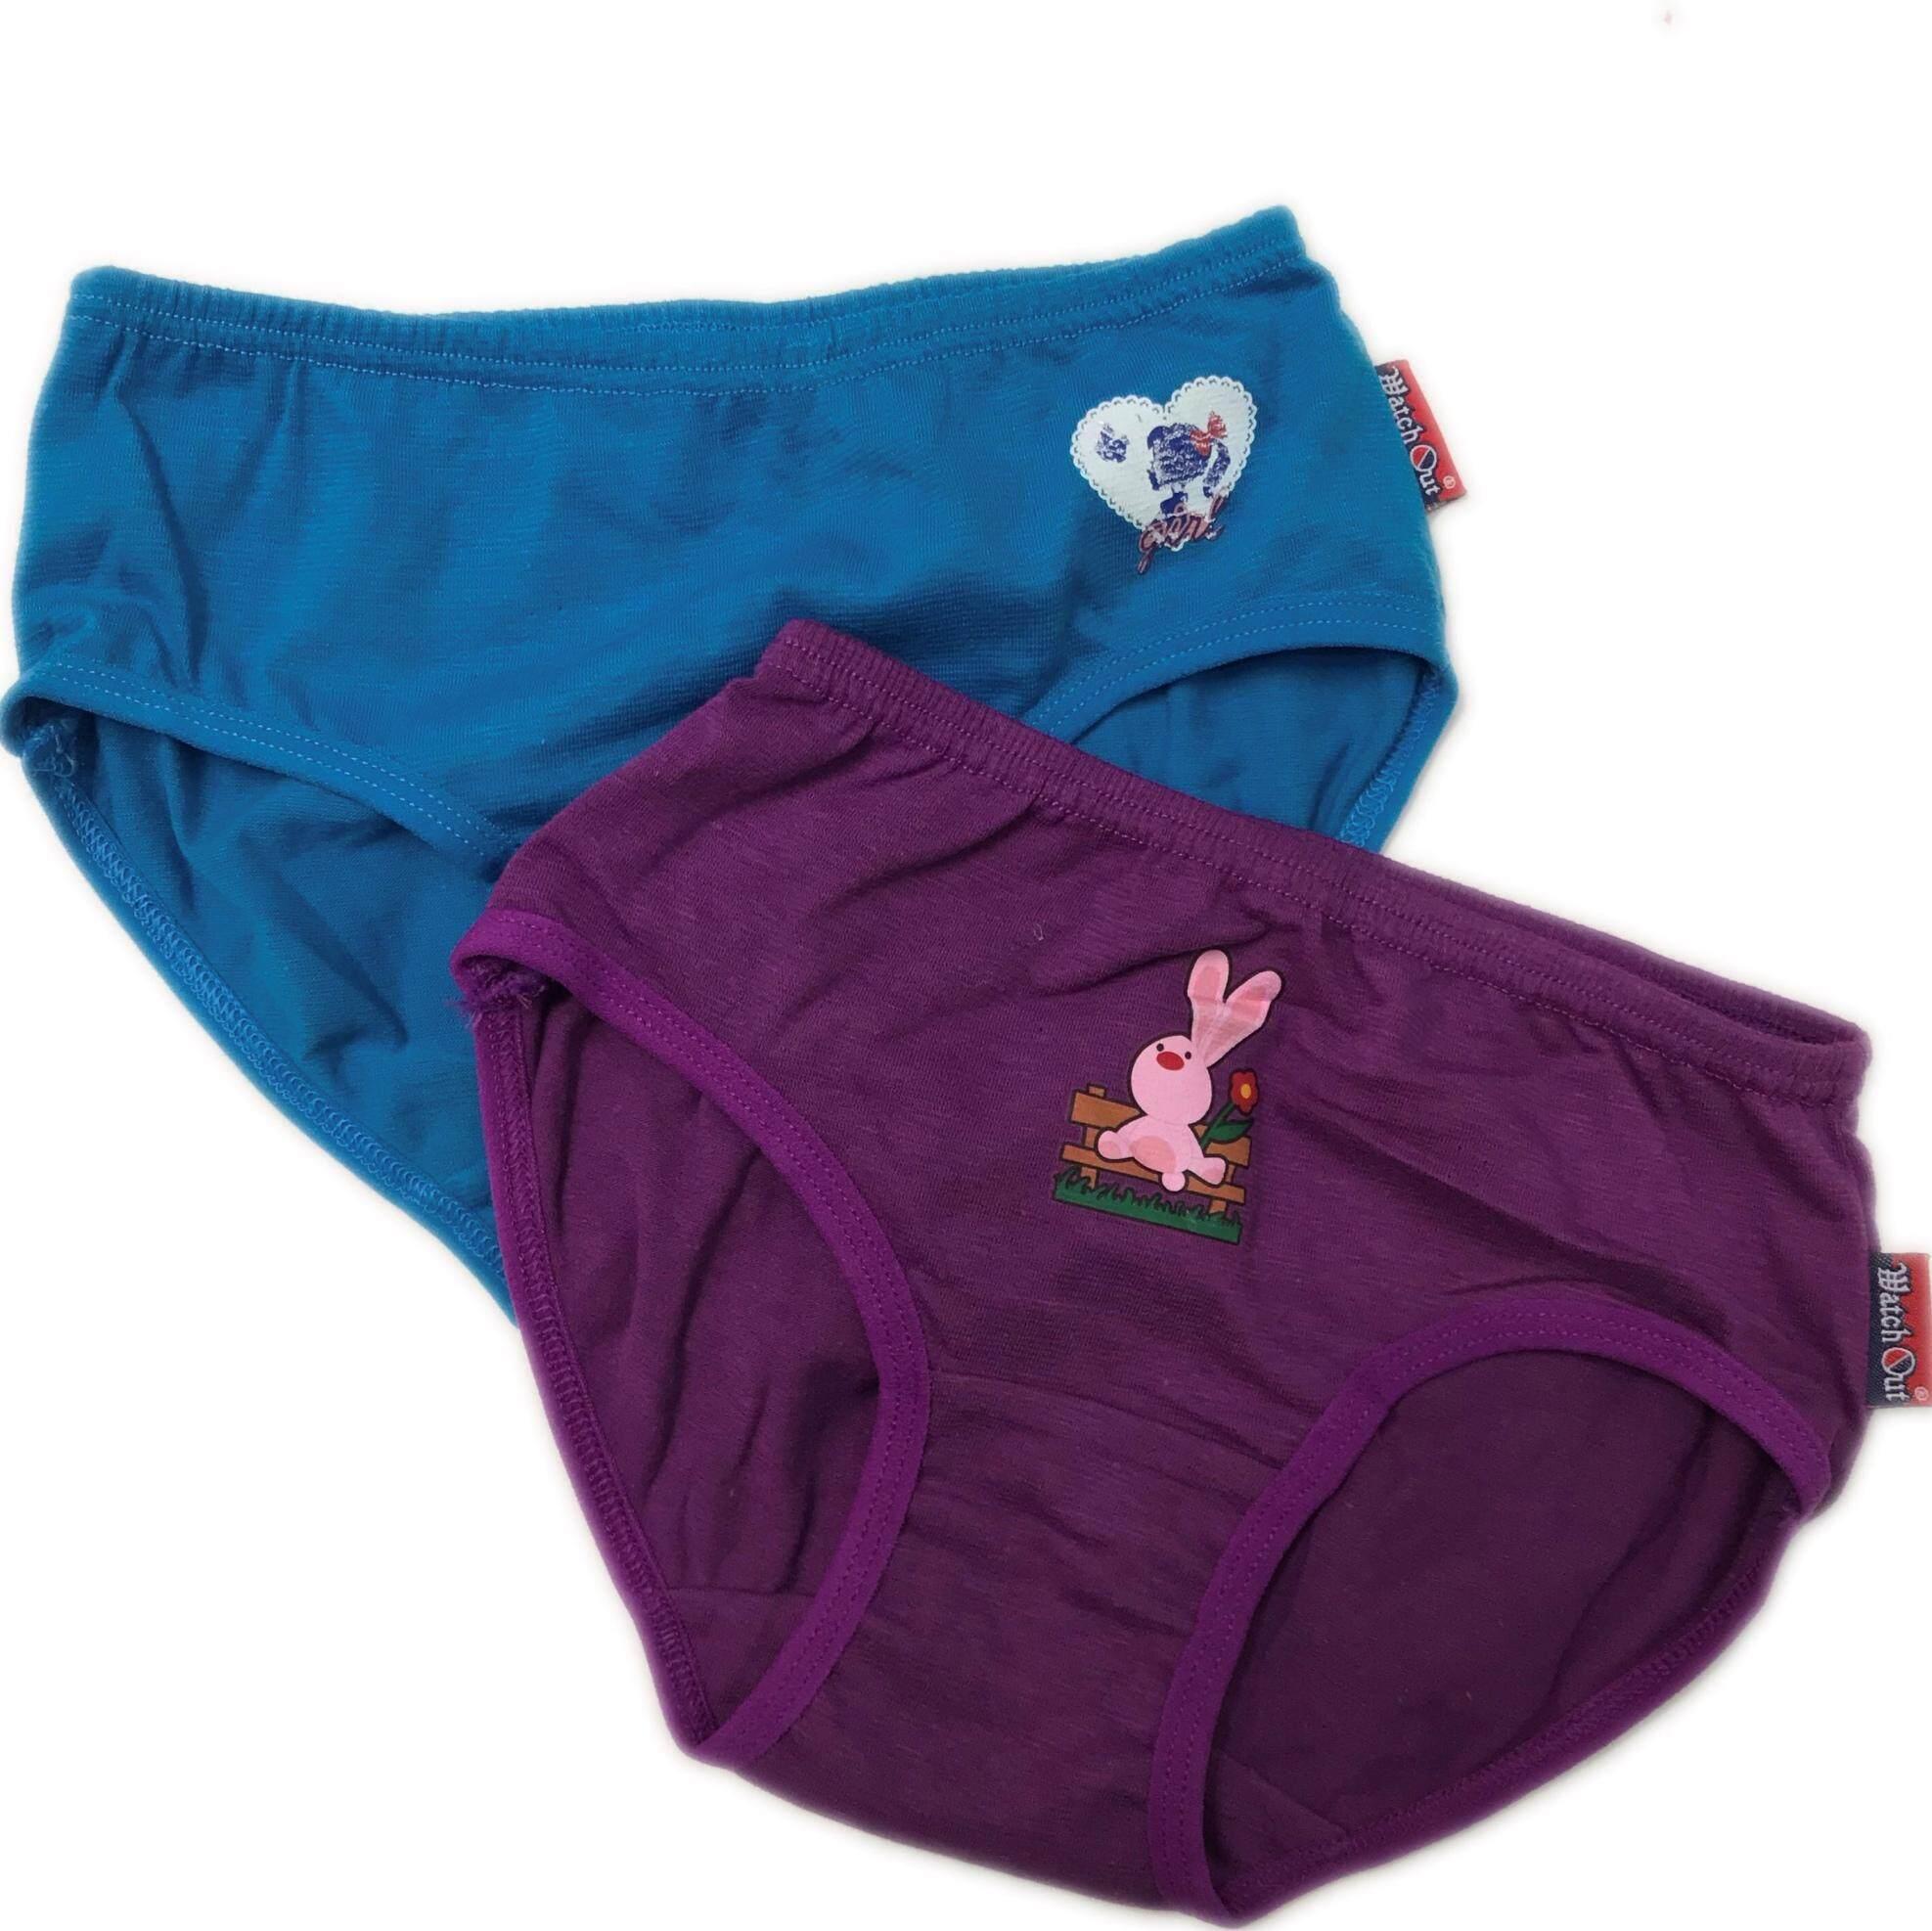 KIDDY KIDS WEAR COTTON UNDERWEAR GIRLS (SELUAR DALAM) SHORTIES BRIEFS PANTIES (RANDOM COLOR) 2PCS/LOT